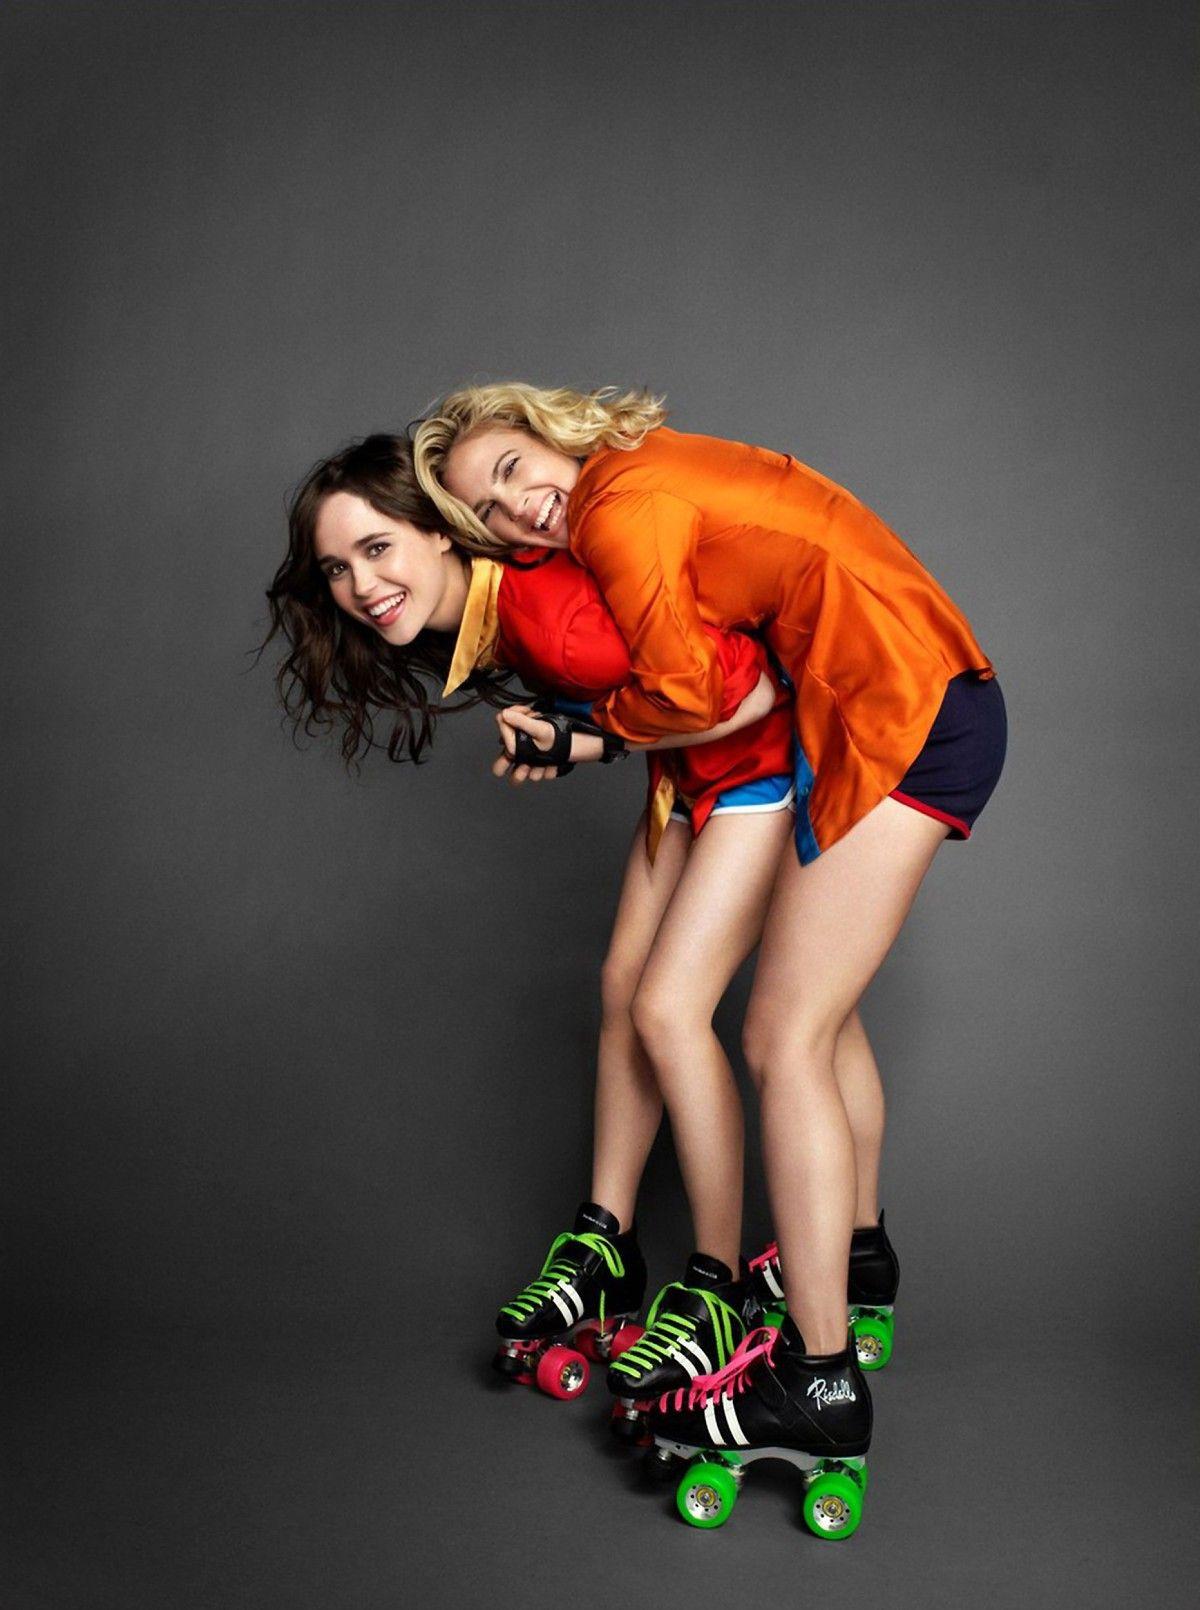 Roller Derby Movie With Drew Barrymore